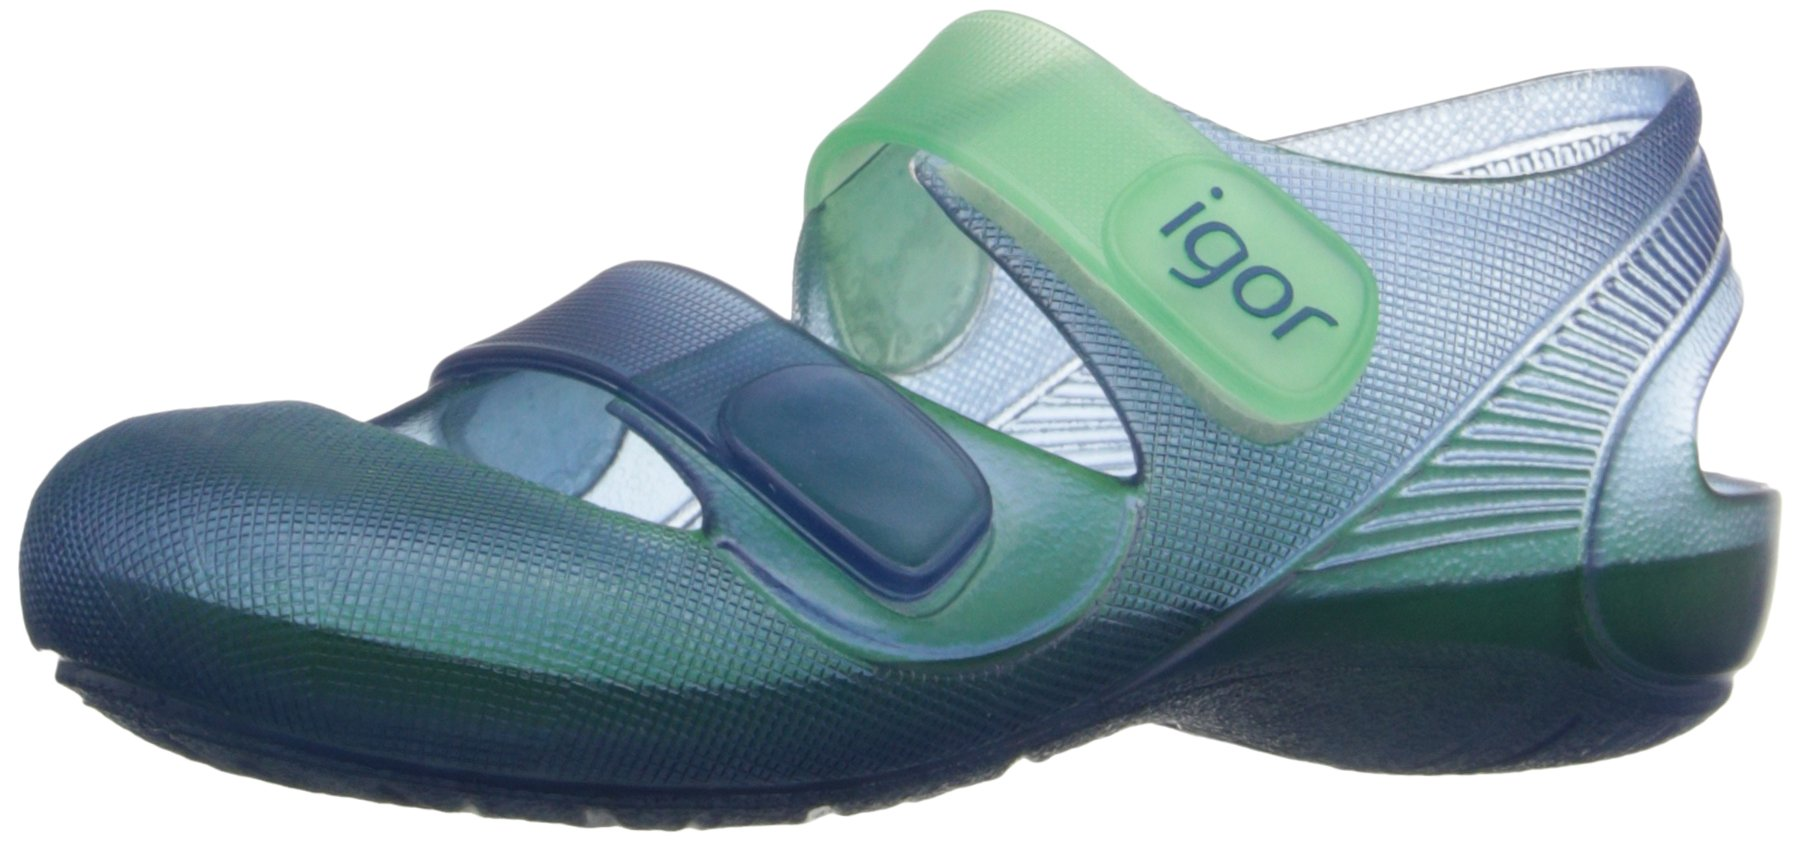 Igor S10146 Boys' Bondi Jelly Sandal, Navy/Green, 26 M EU/9 M US Toddler